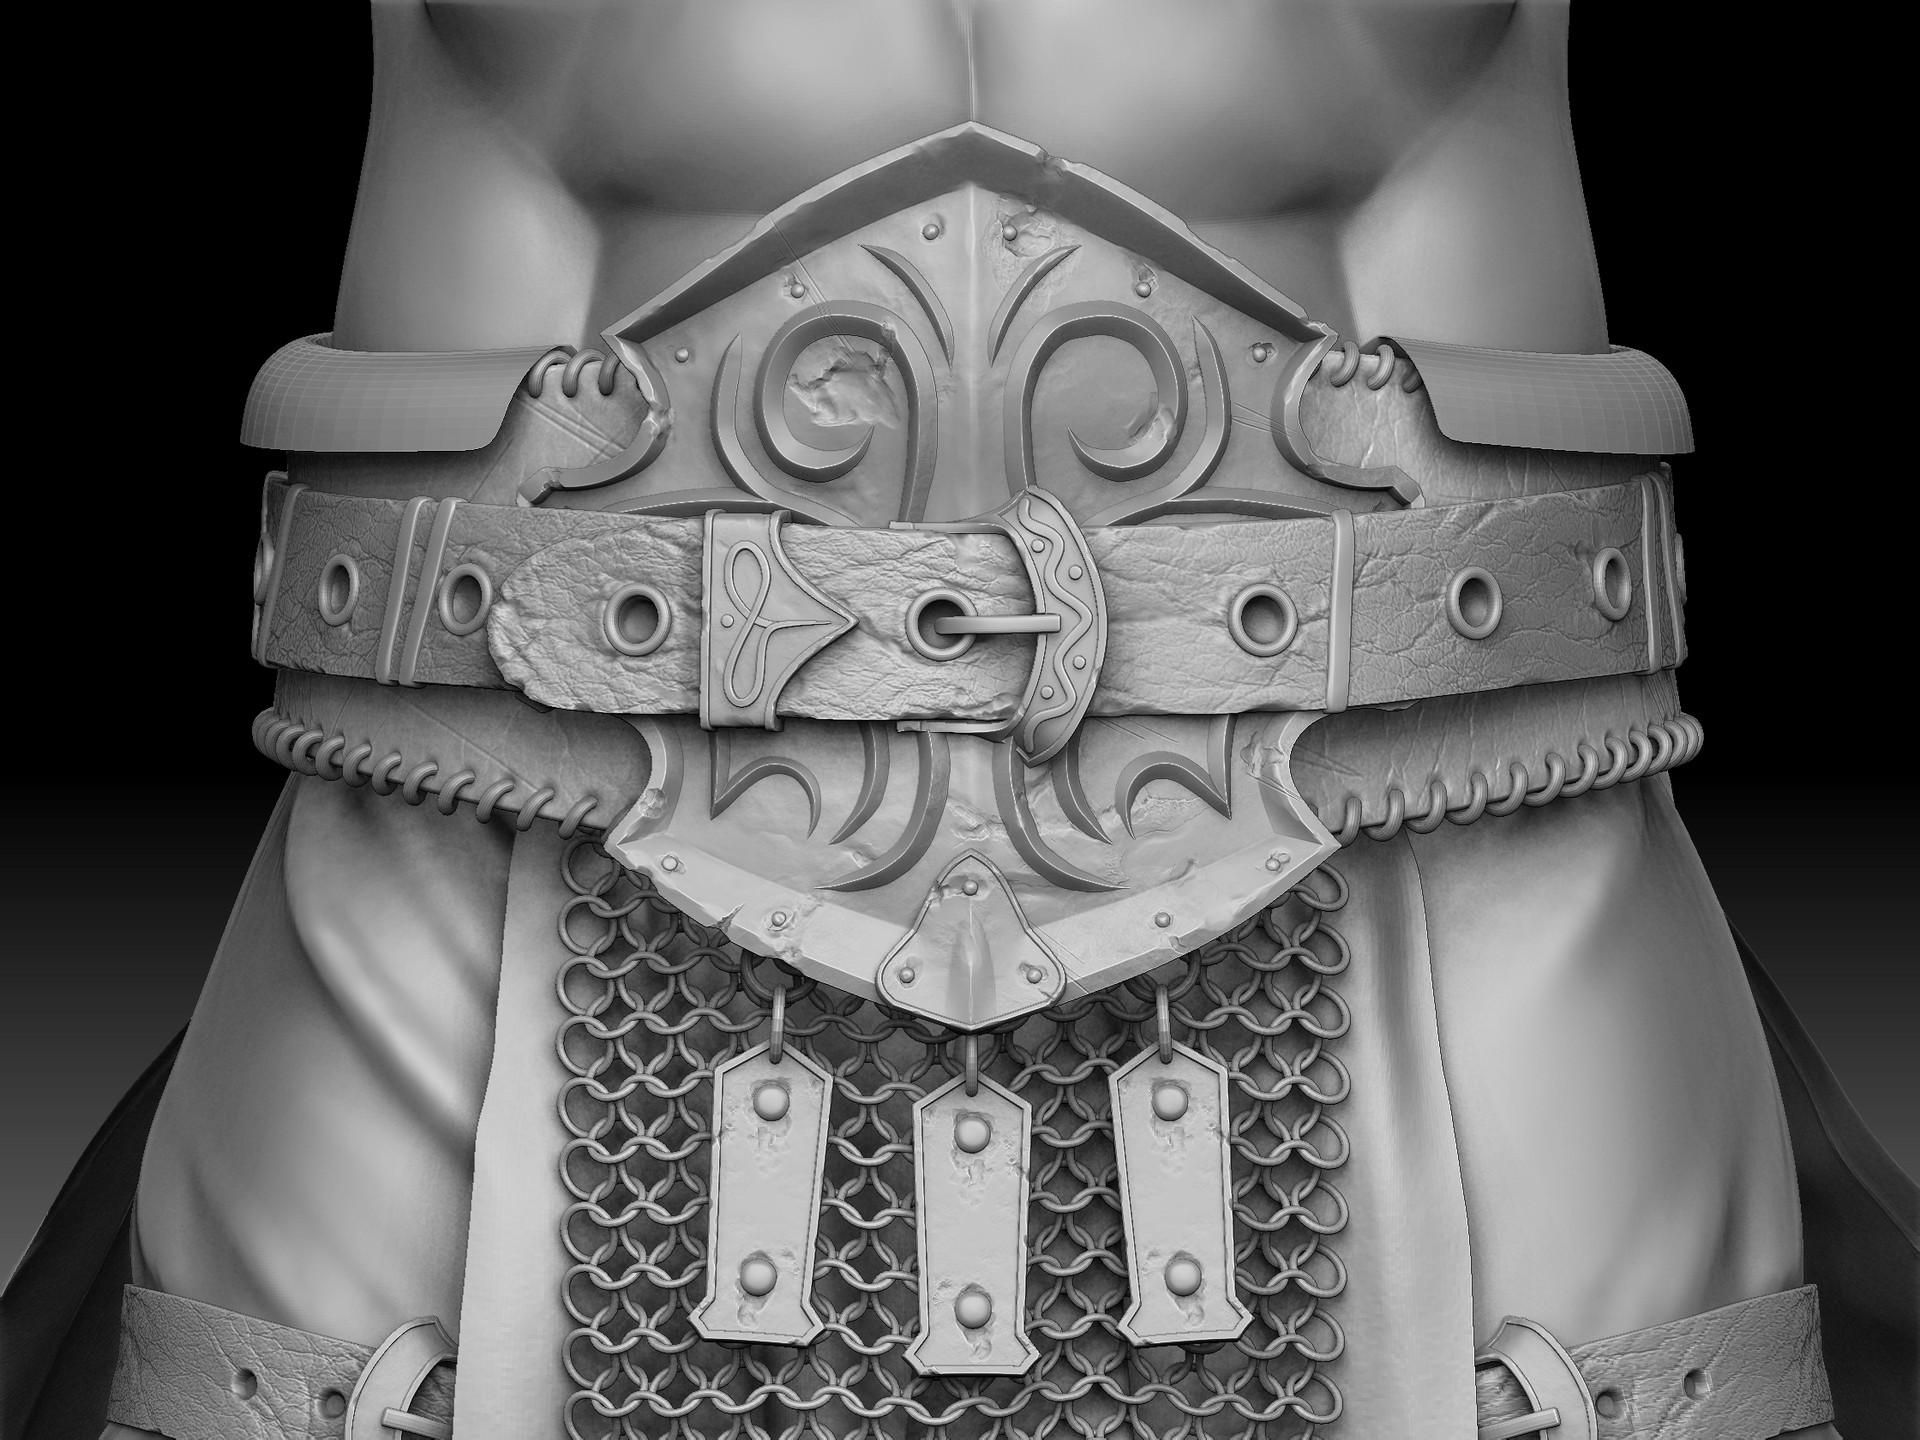 Danaos christopoulos sb sculptwip 4